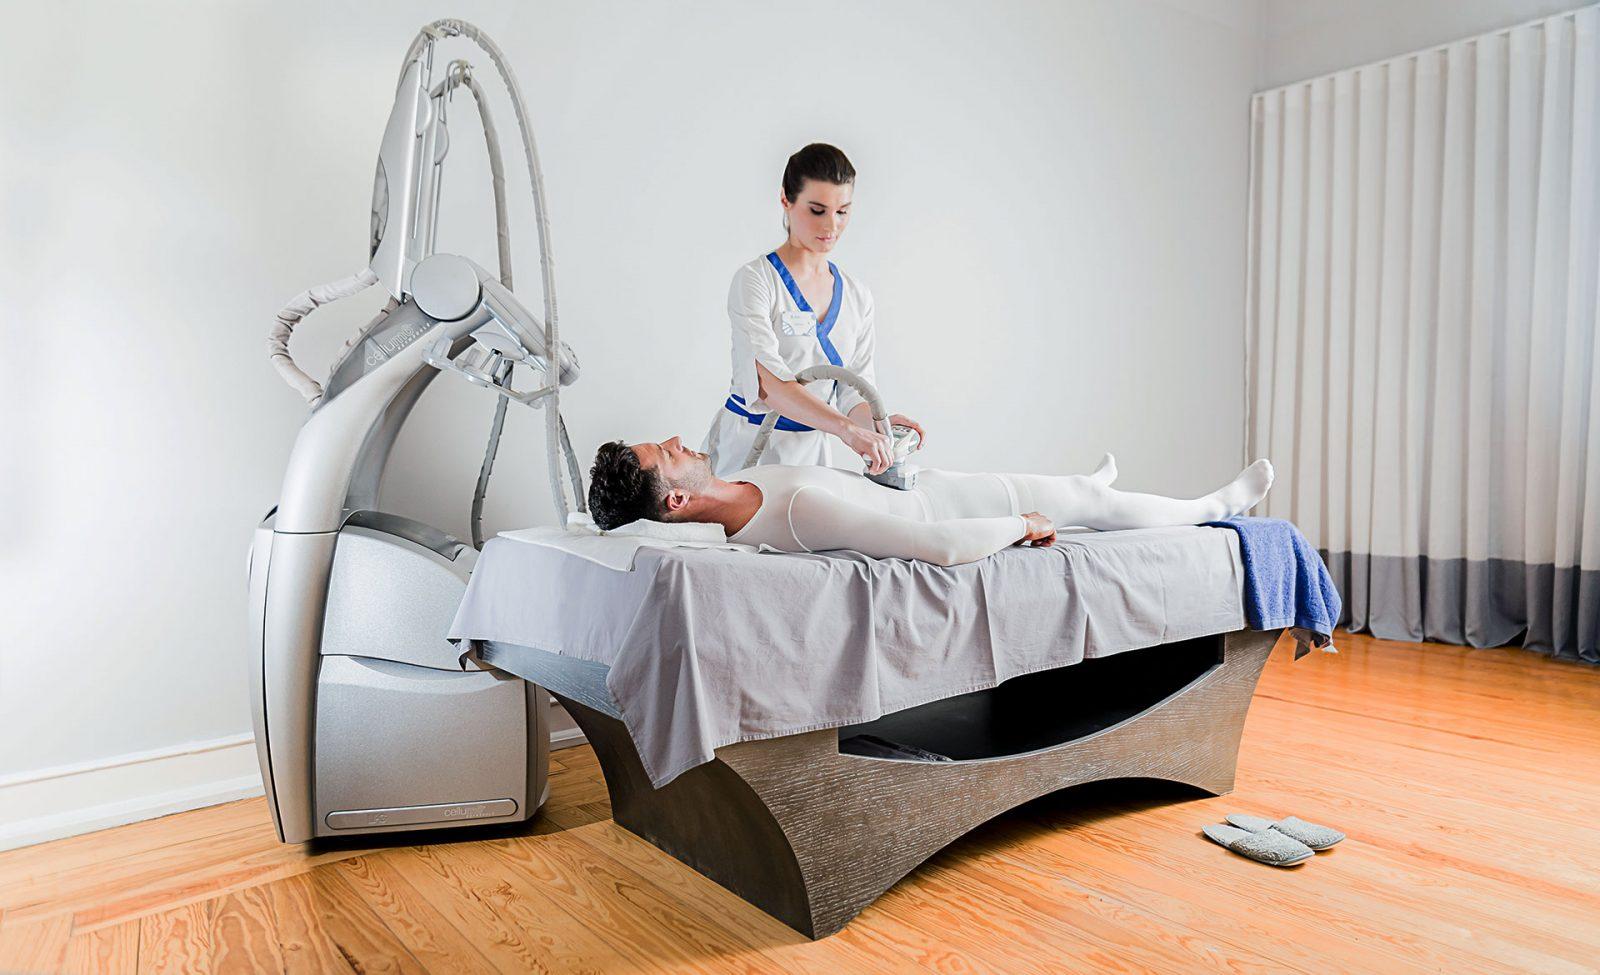 bodyscience-clinica-estetica-tratamentos-corpo-endermologia-lpg